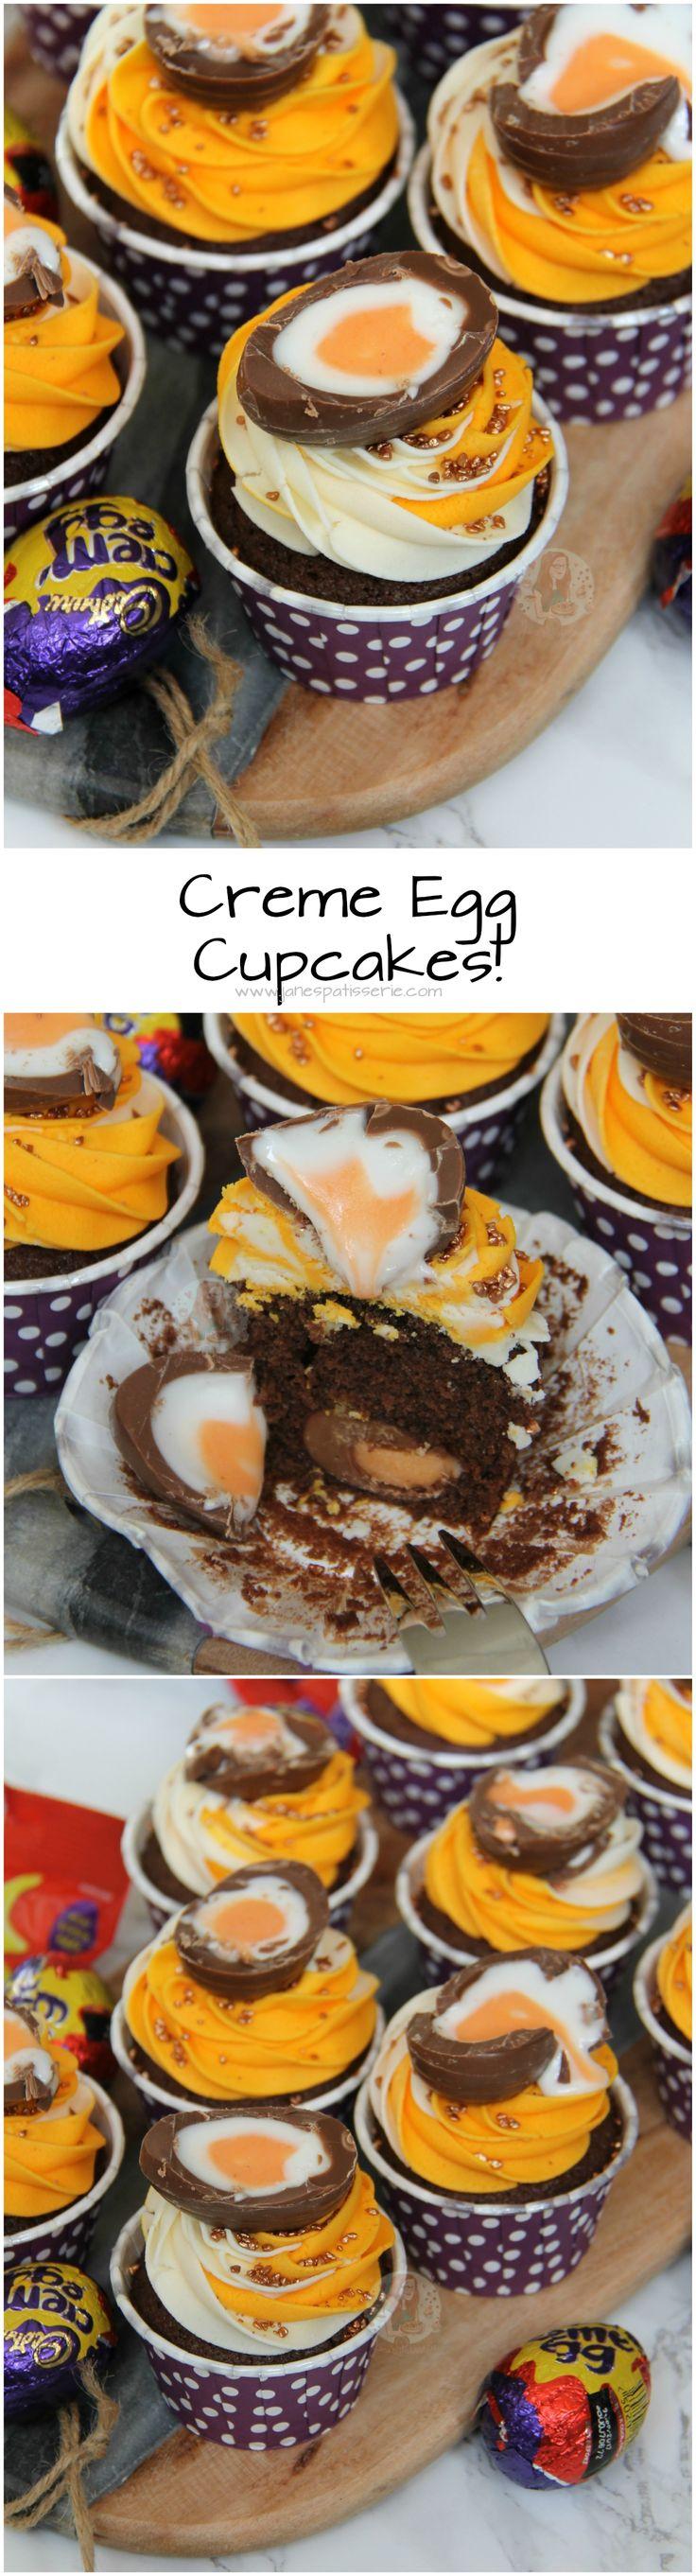 Best 25+ Creme egg cake ideas only on Pinterest | Cadbury creme ...